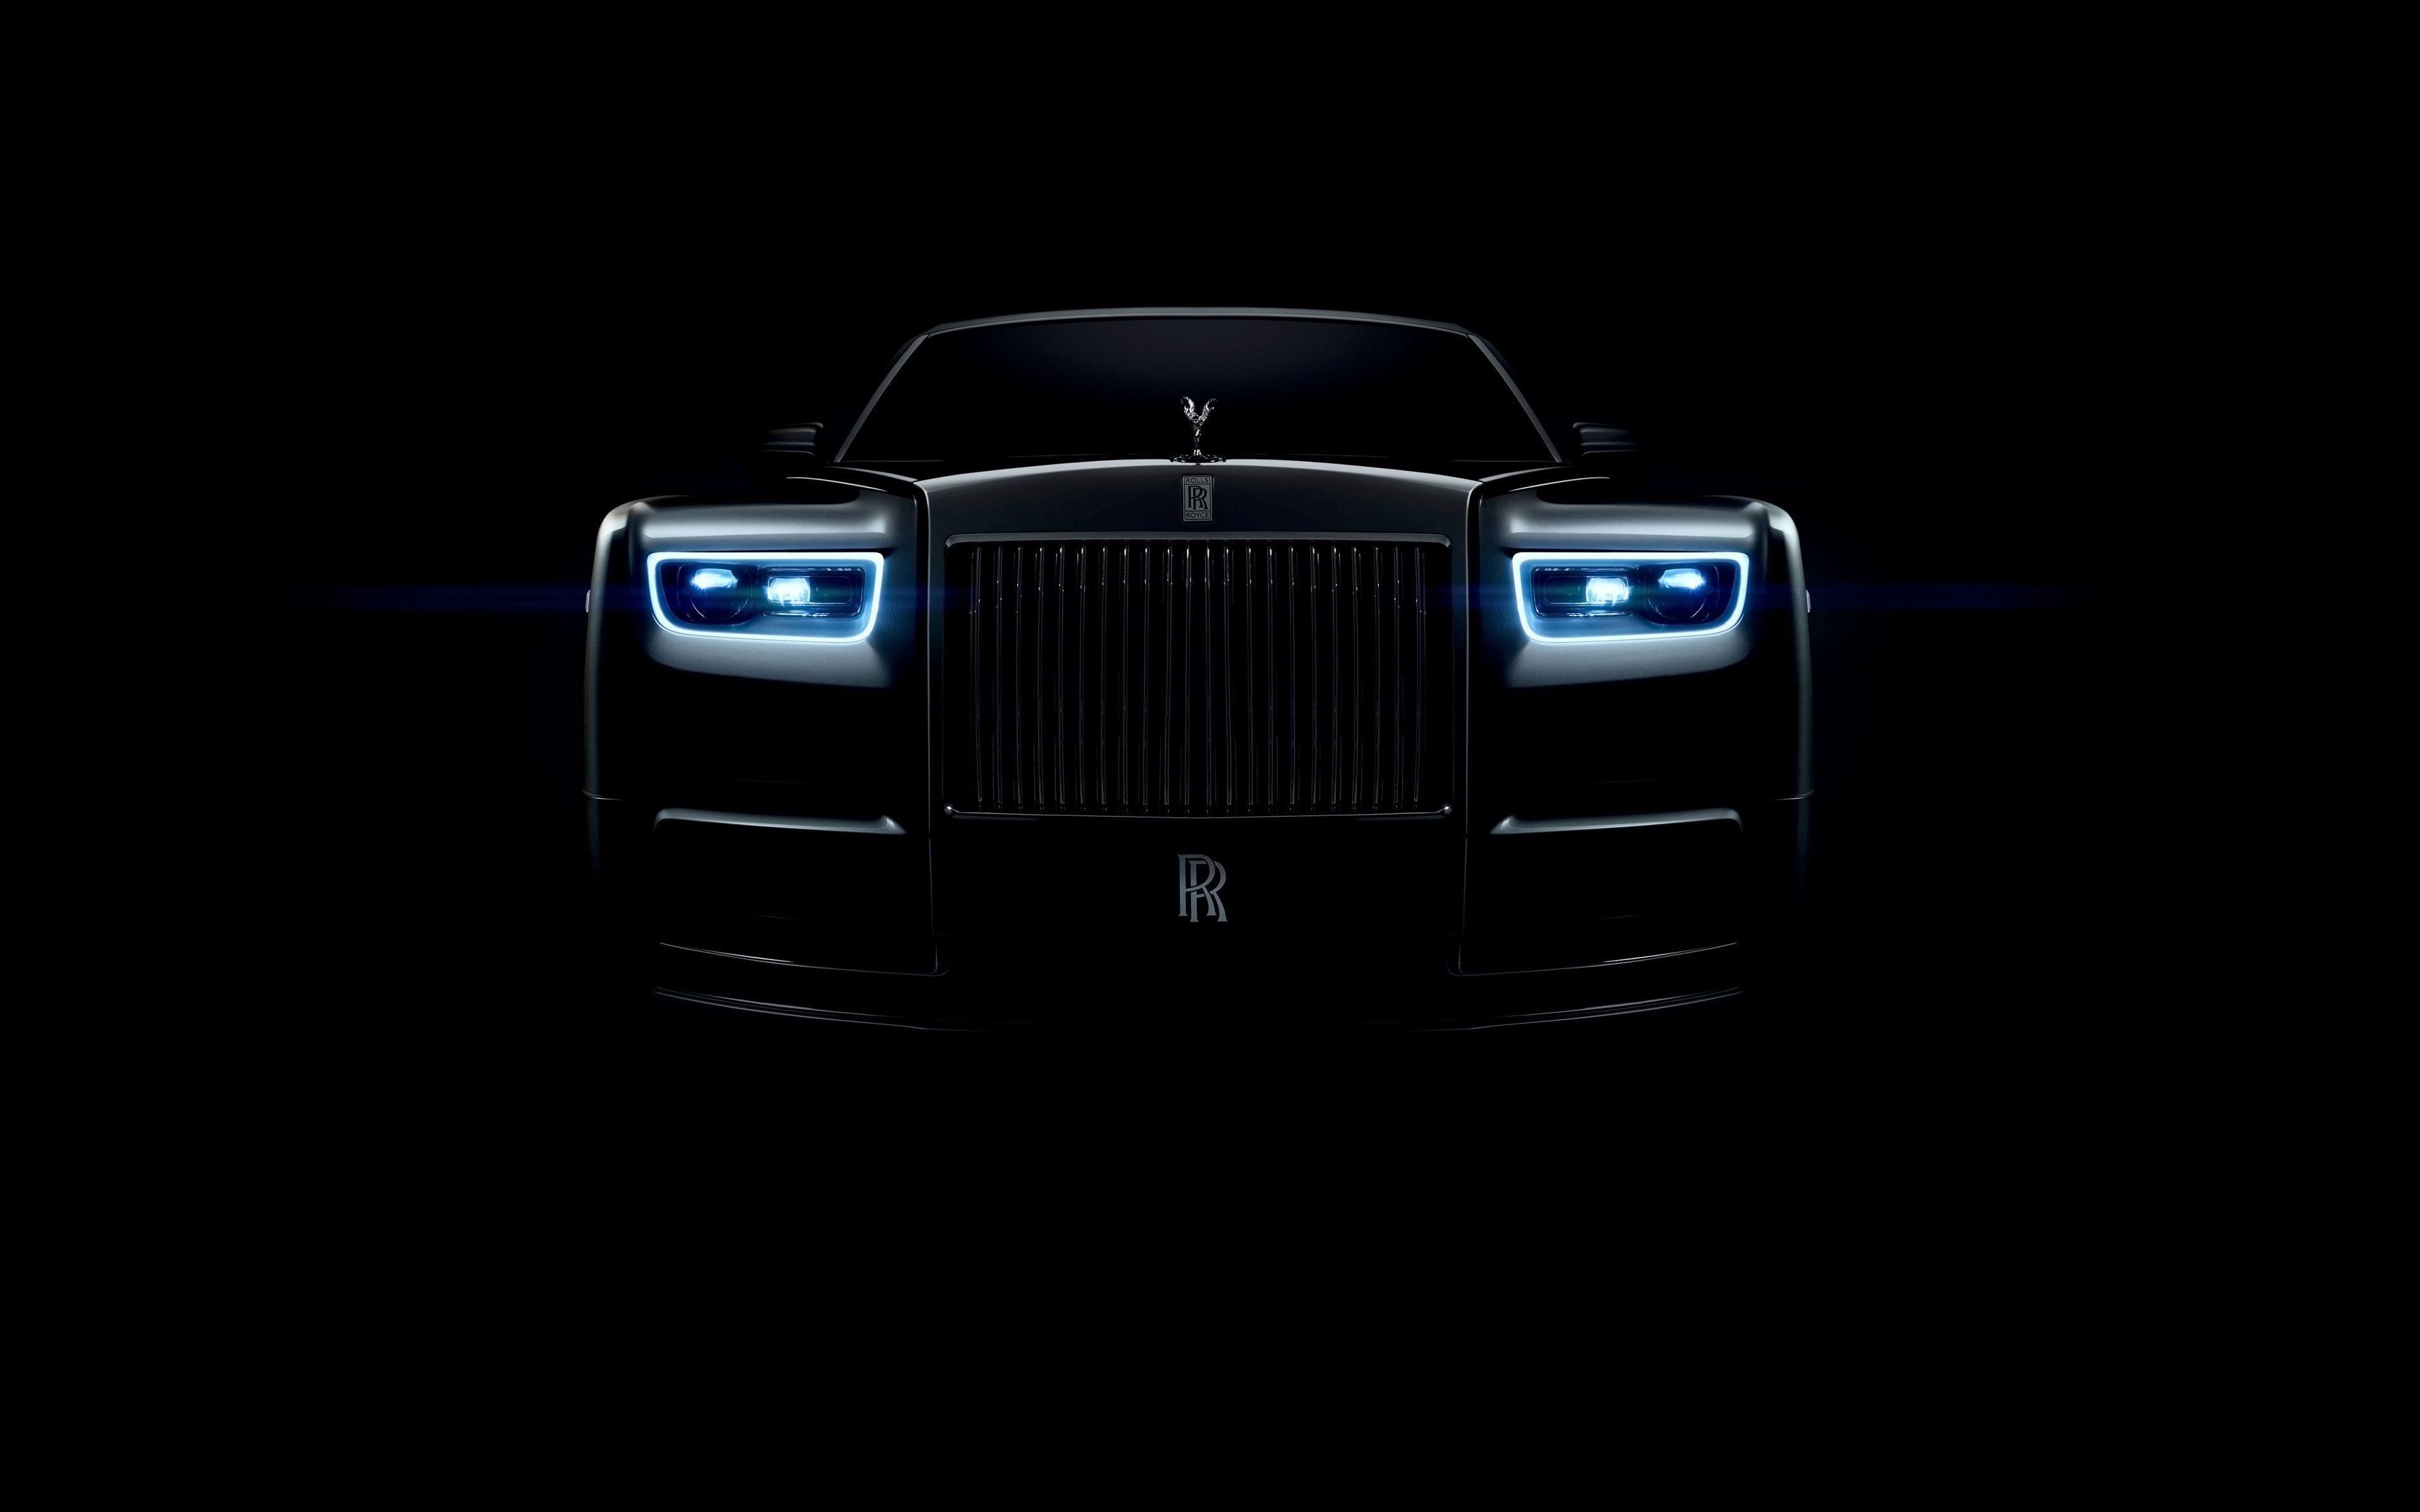 Rolls Royce Phantom Wallpapers Top Free Rolls Royce Phantom Backgrounds Wallpaperaccess